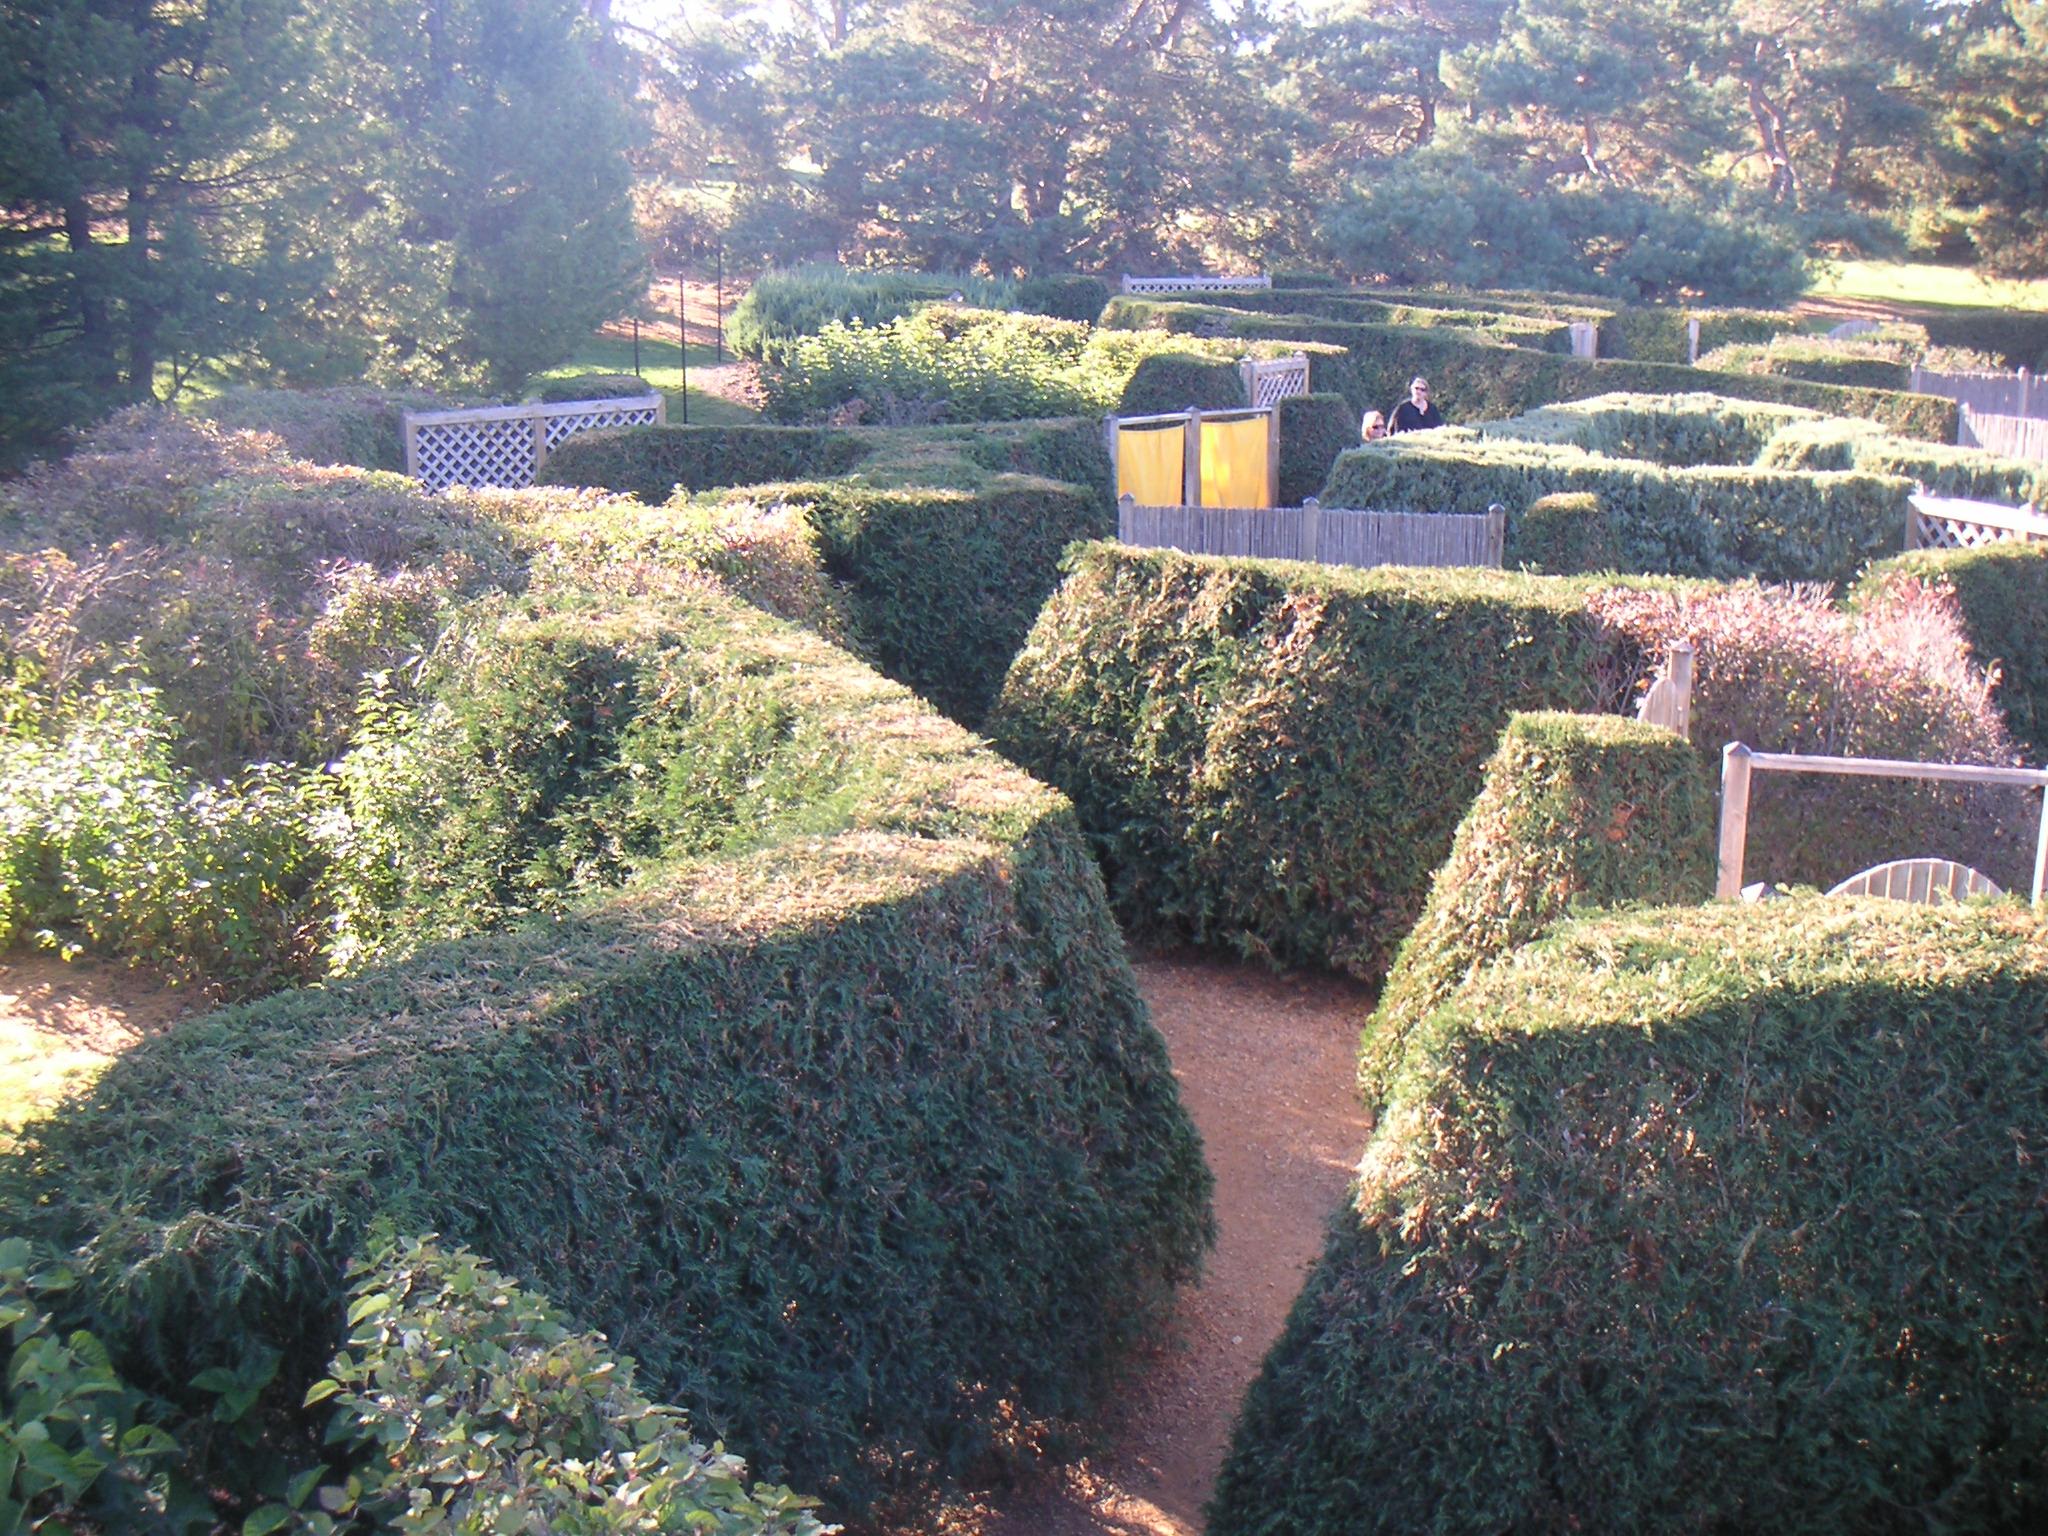 The Minnesota Landscape Arboretum's Hedge Maze